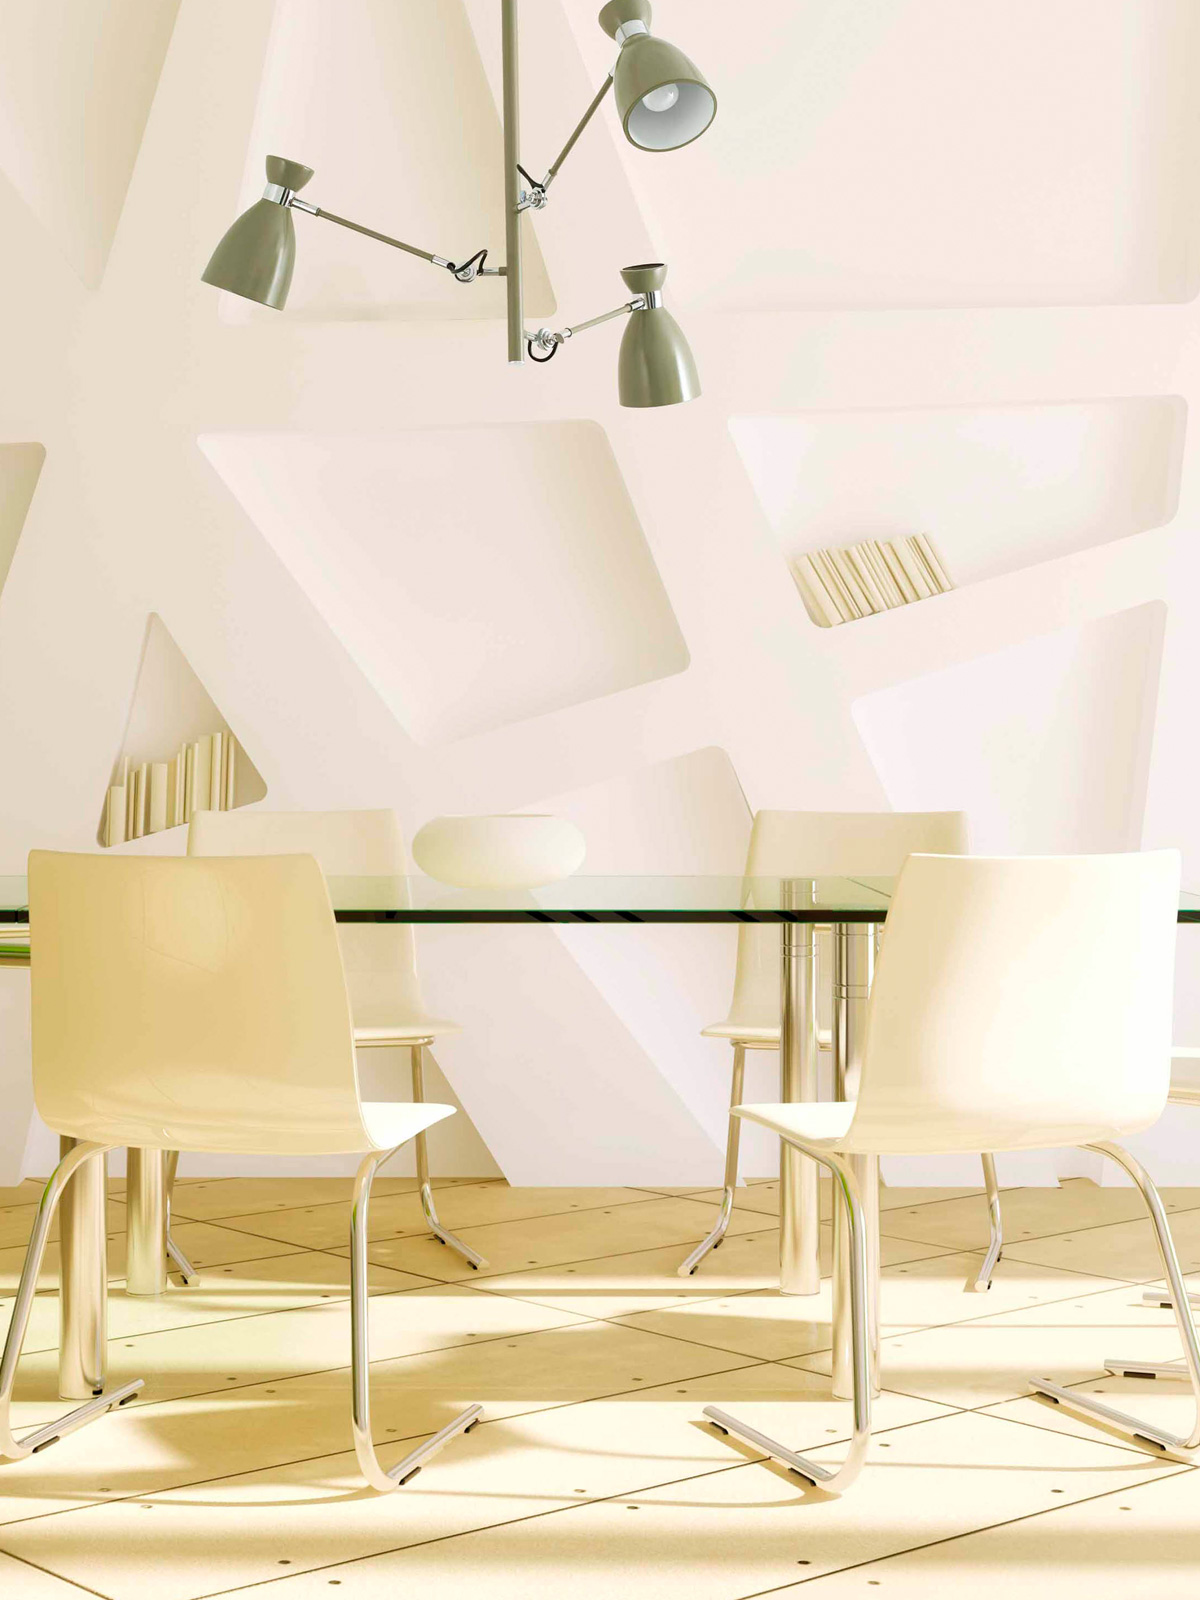 Designerleuchte Retro von Faro Barcelona